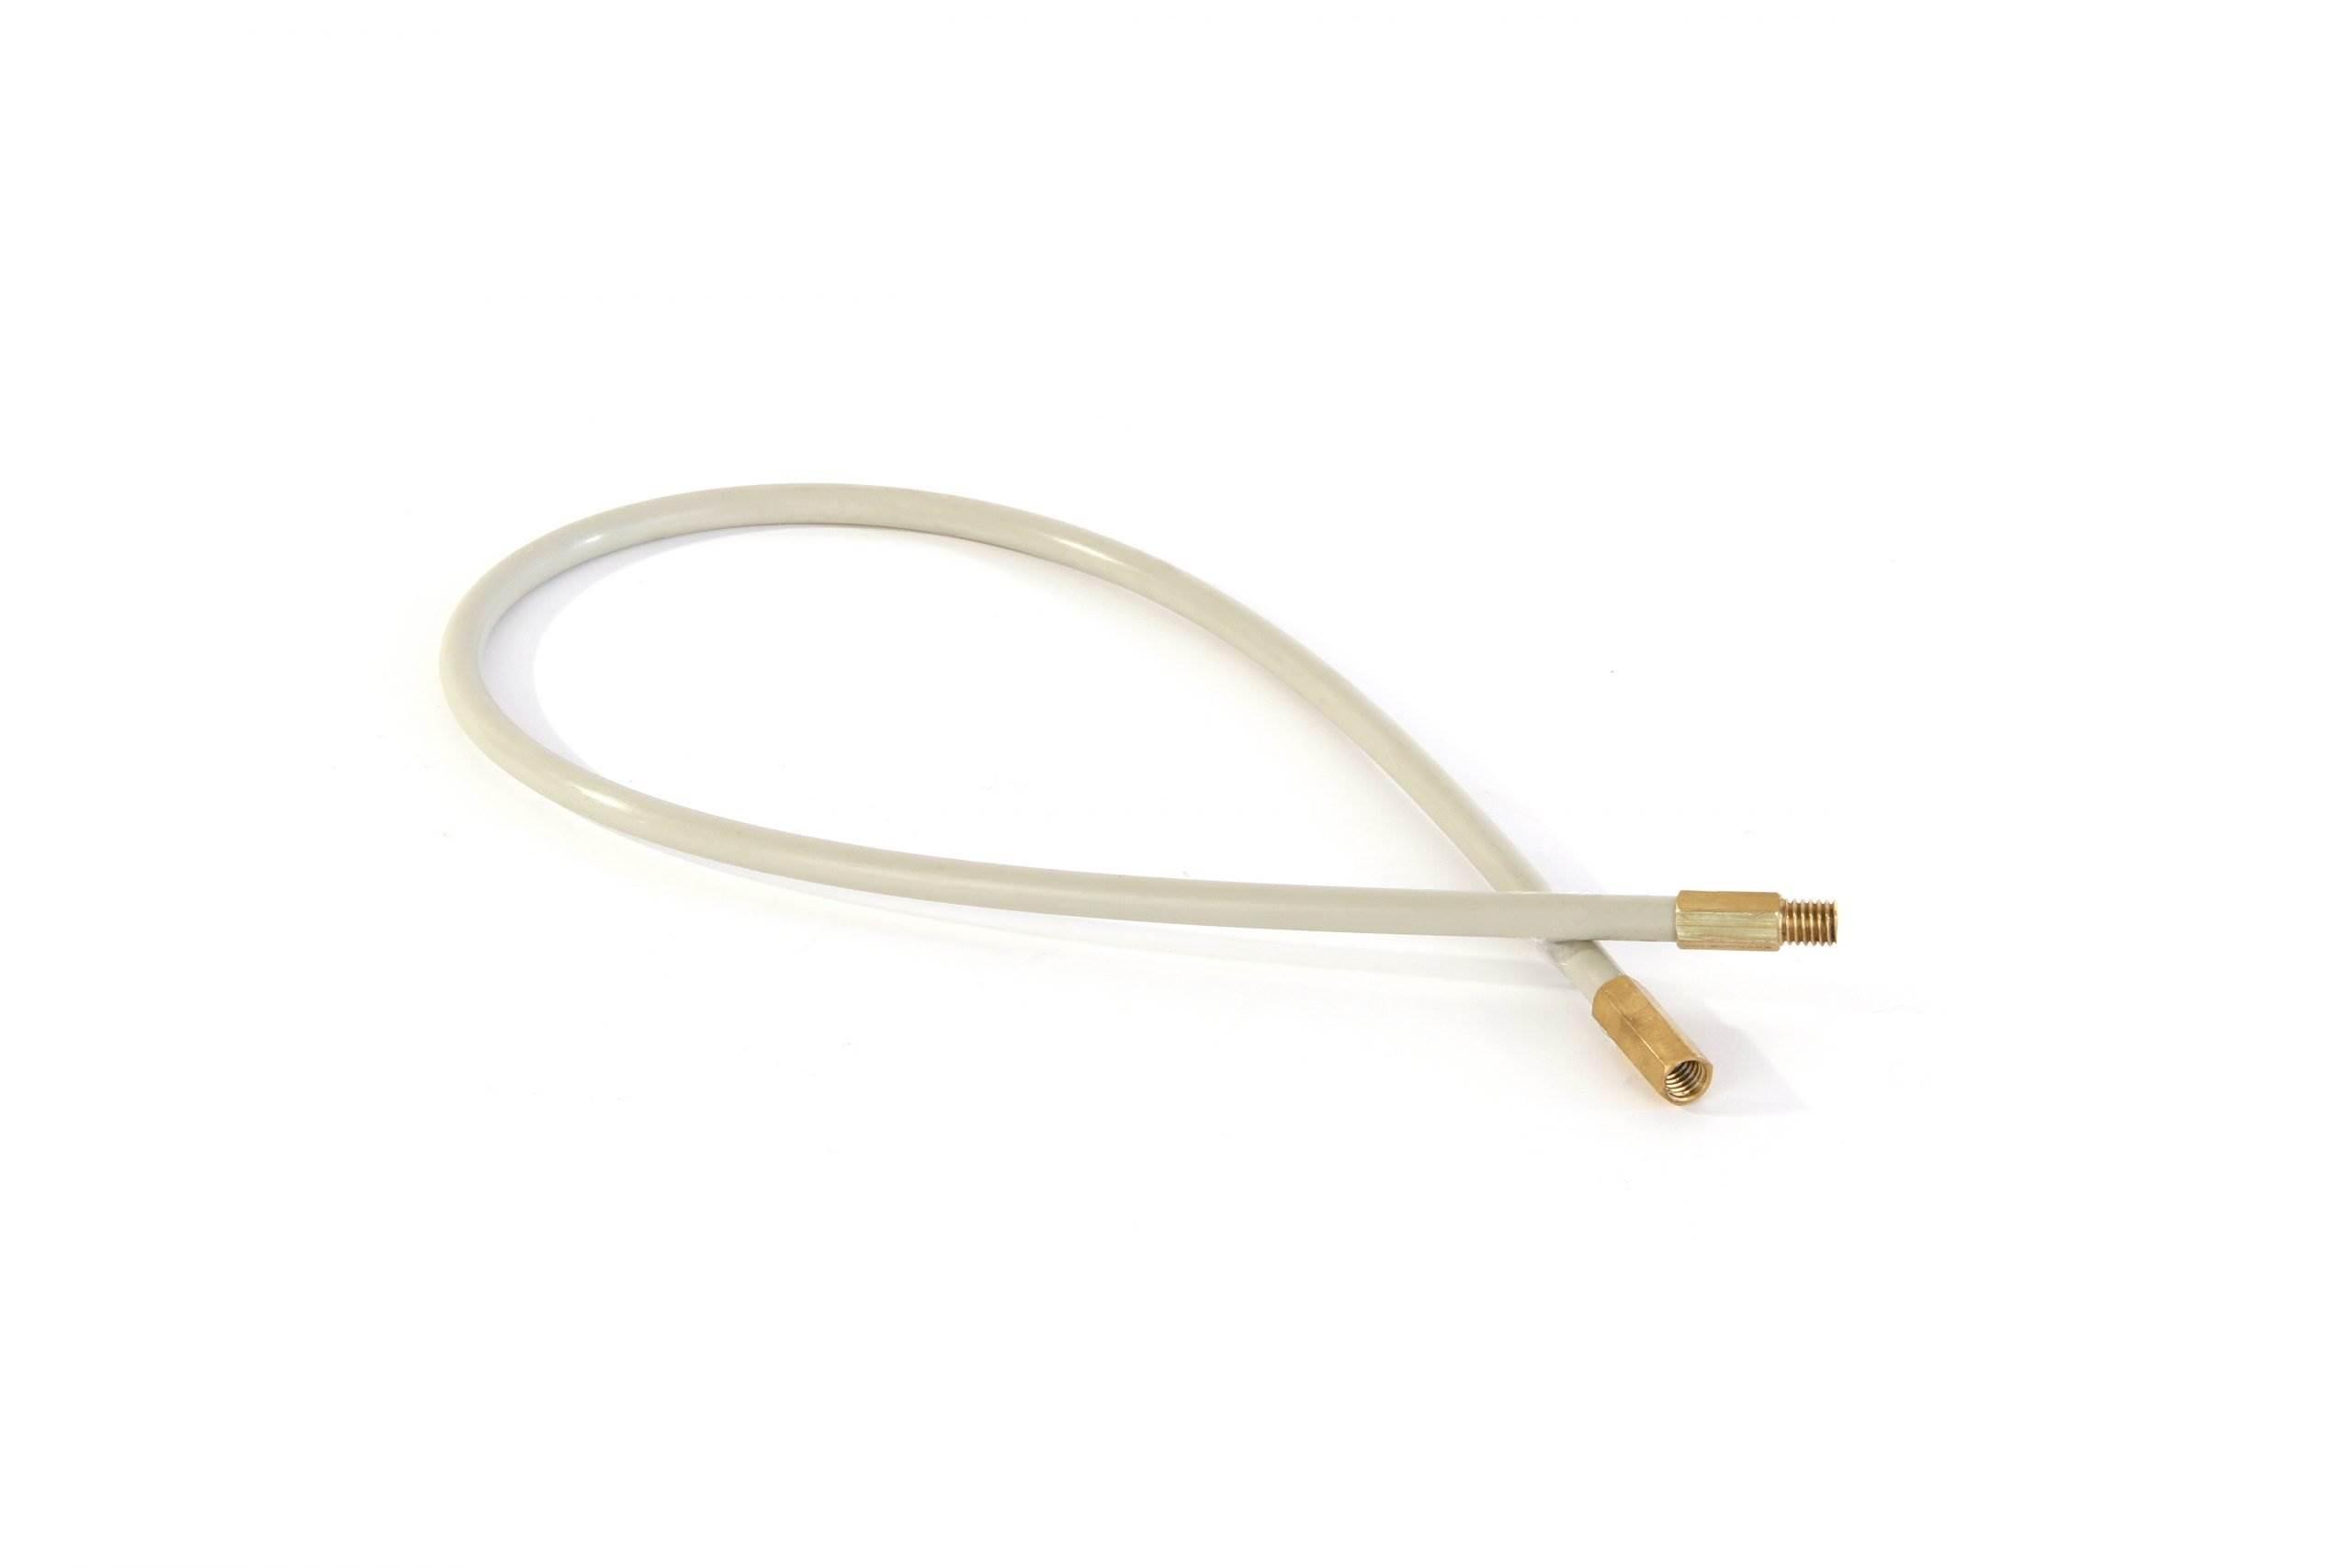 Flexible Liner Chimney Rod bent